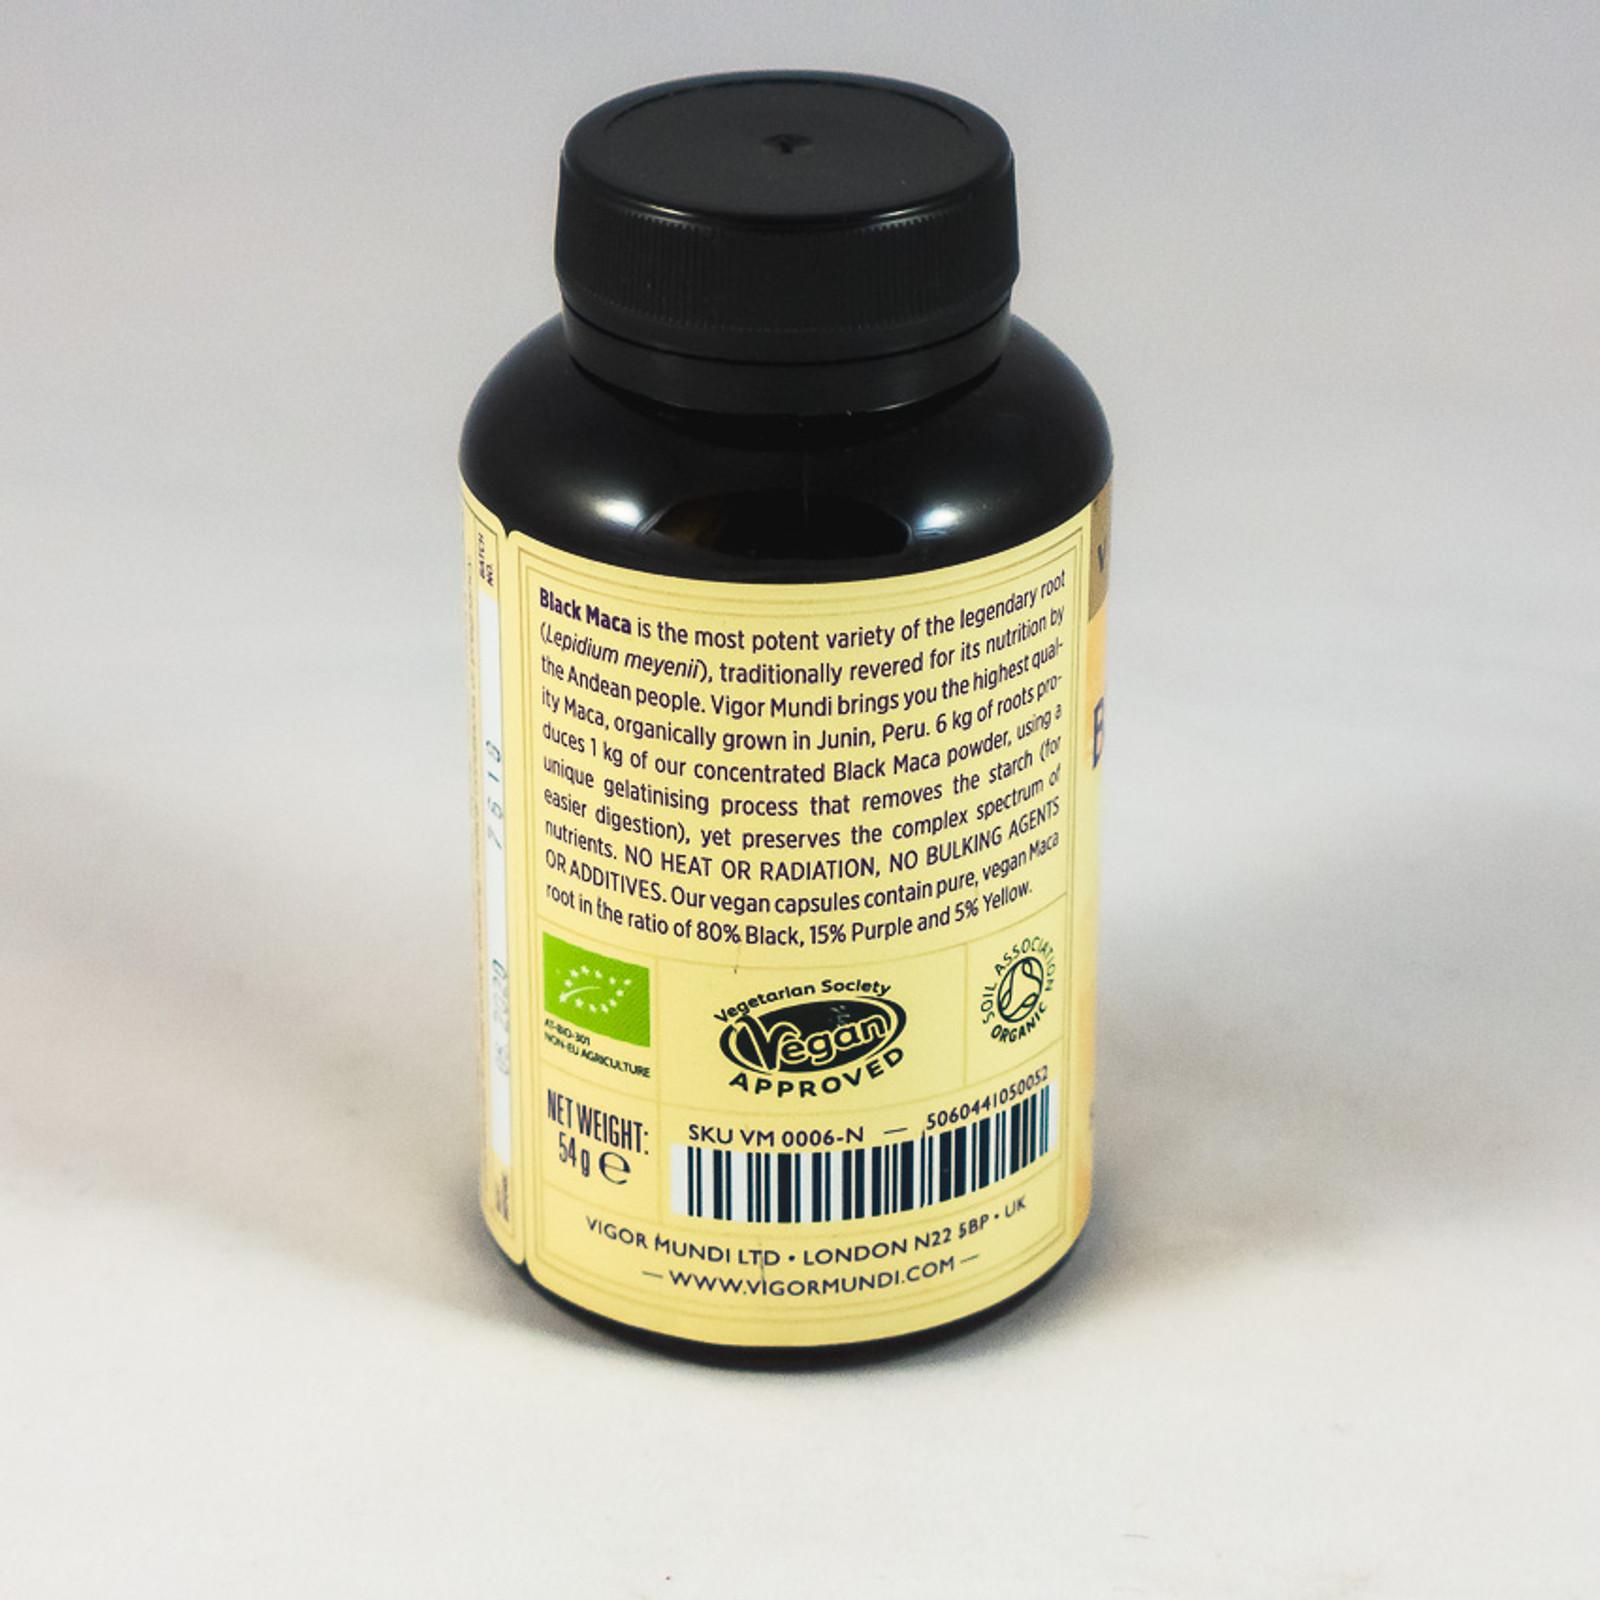 Raw Organic Black Maca Capsules